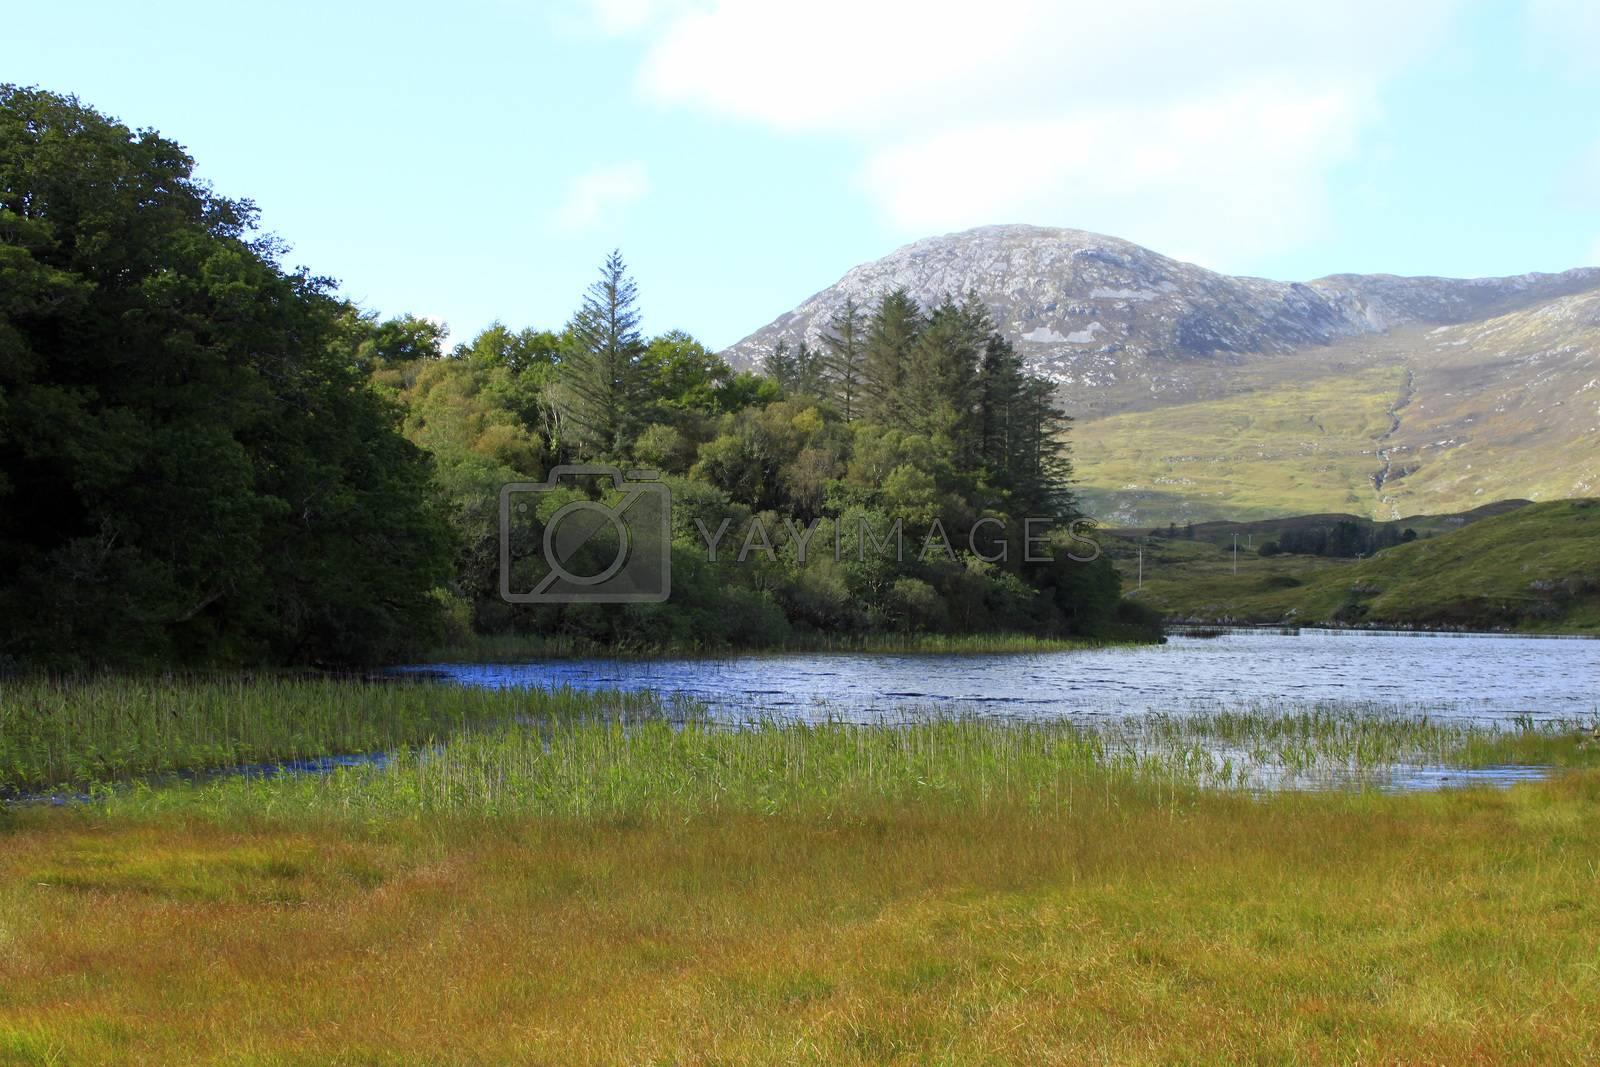 Royalty free image of Connemara rural scene by a_phoenix